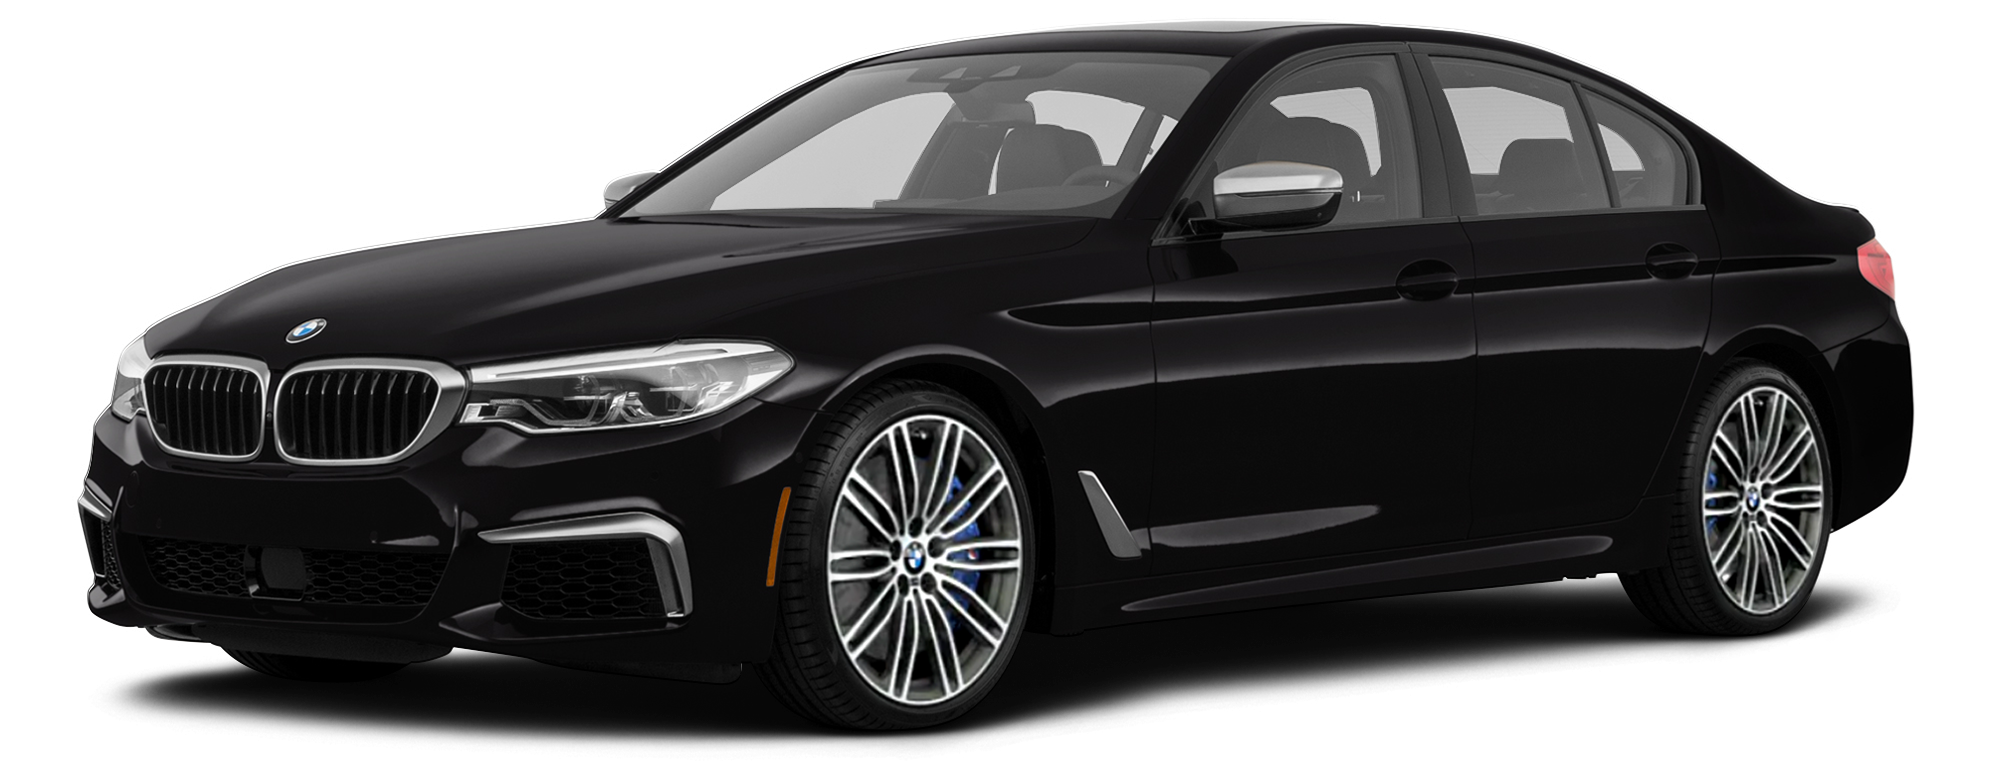 2019 BMW M550i Incentives, Specials & Offers in Cincinnati OH